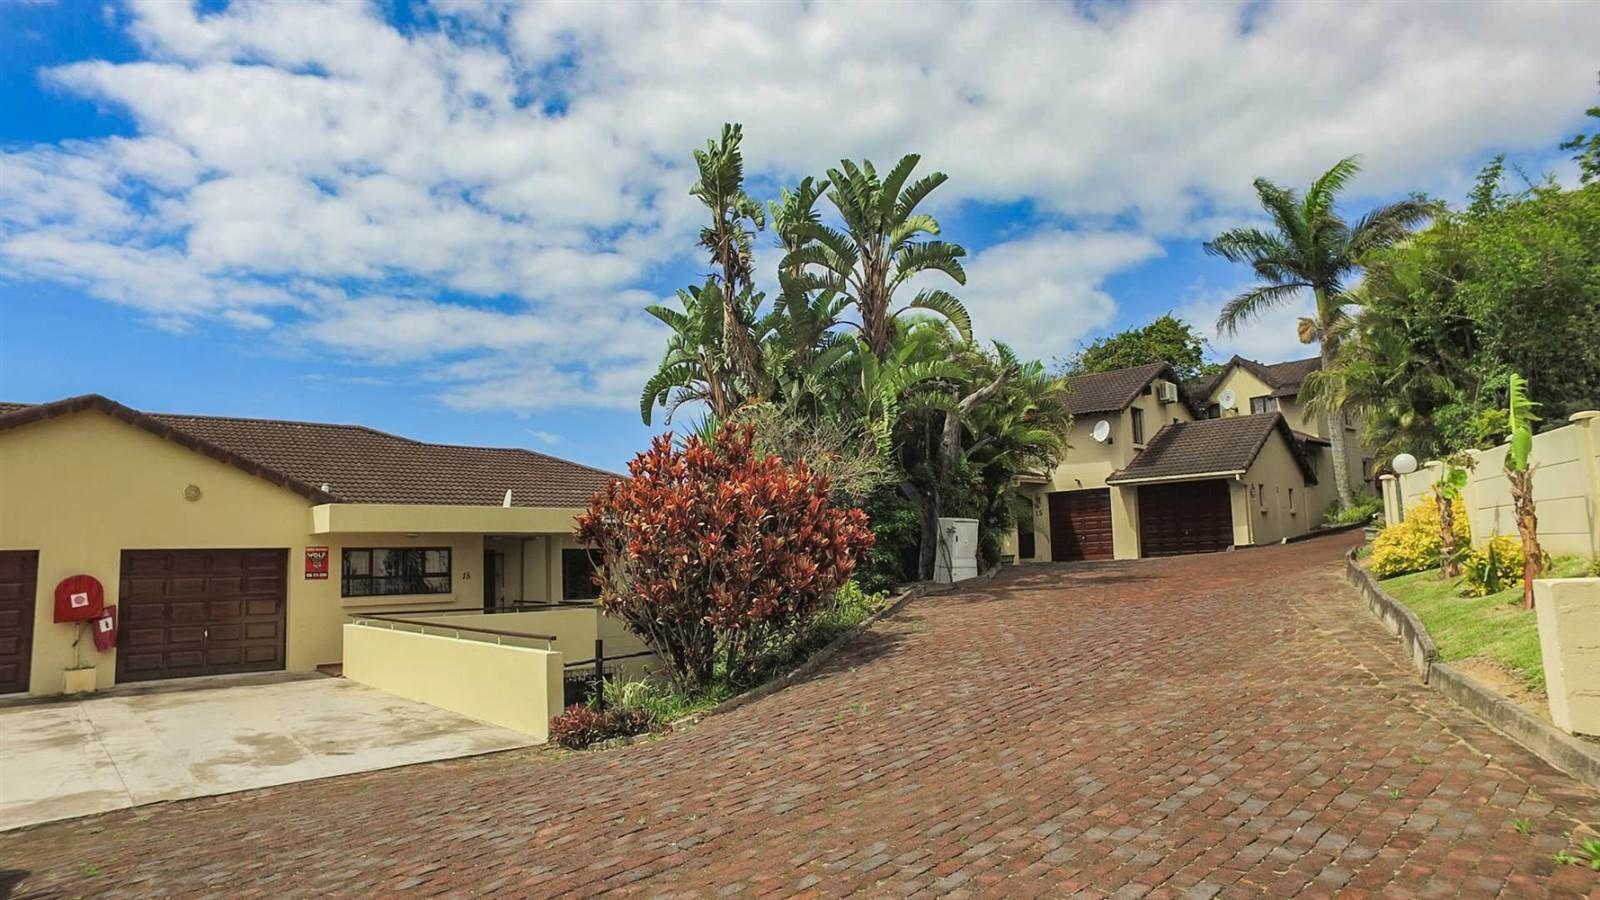 Explore This Property 3 Bedroom Duplex In Ramsgate Duplex For